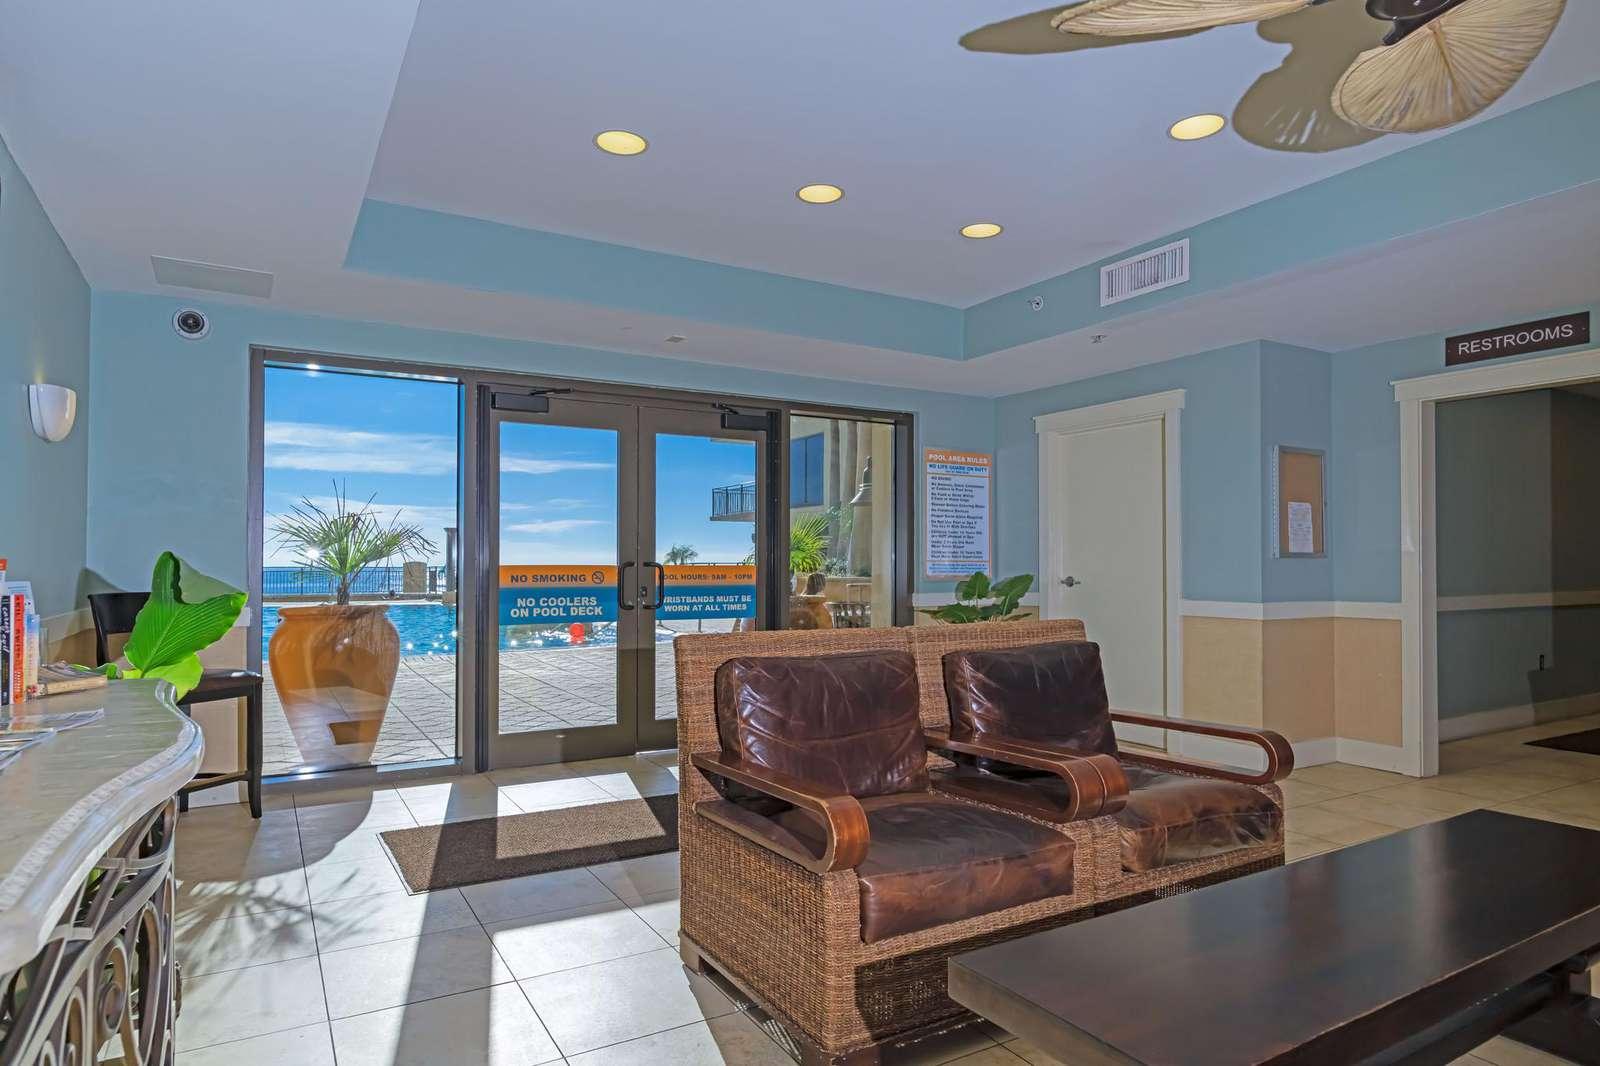 Nice lobby areas with comfy furnishings!